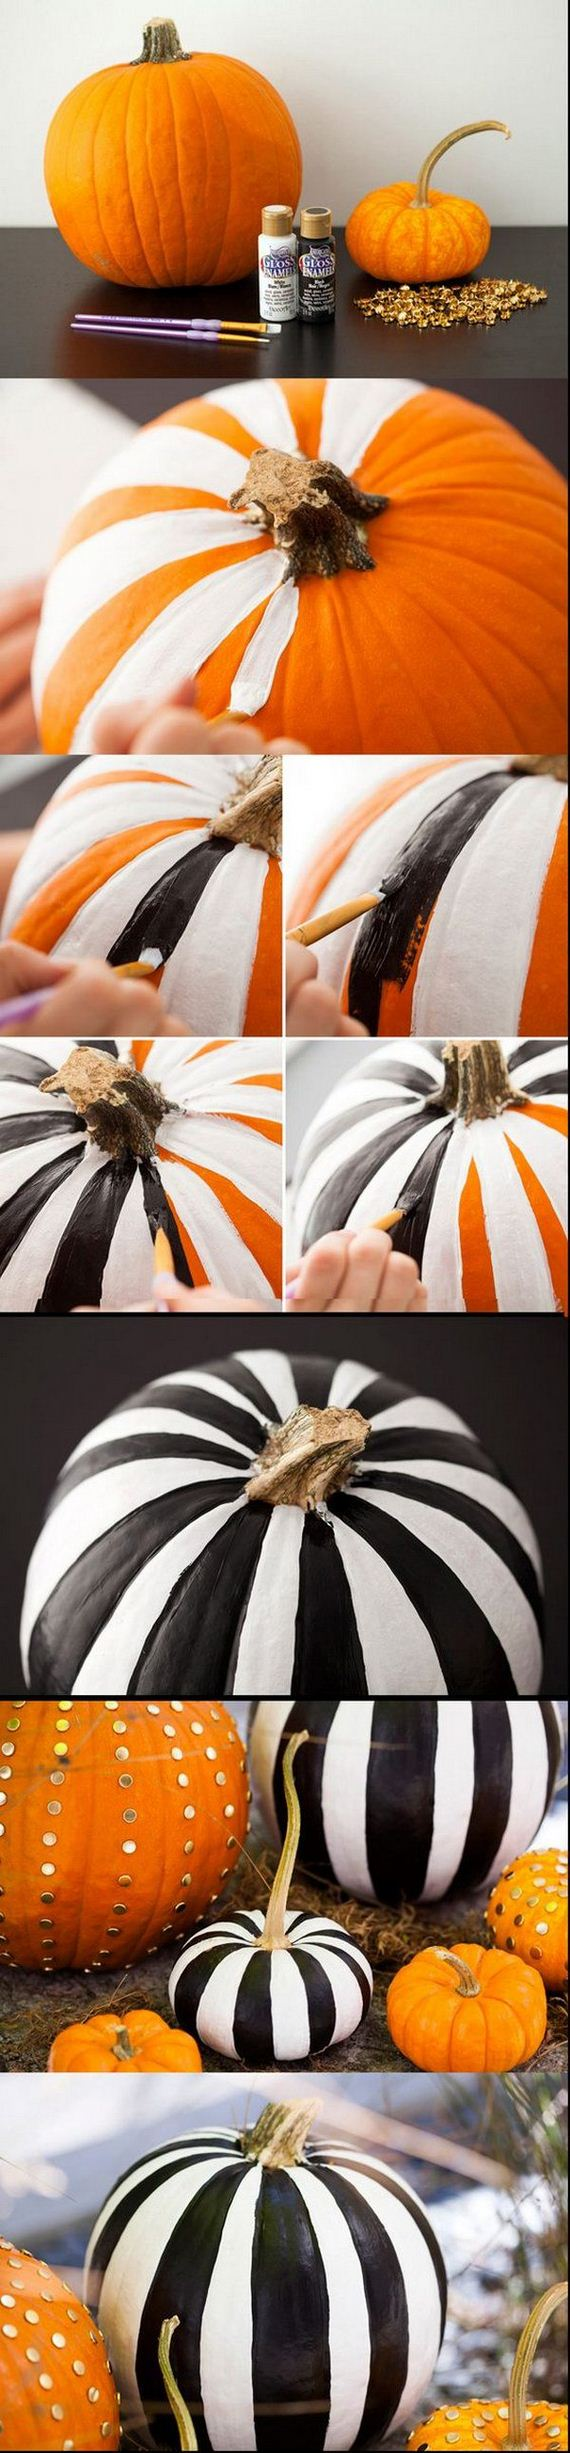 19-no-carve-pumpkin-decorating-ideas